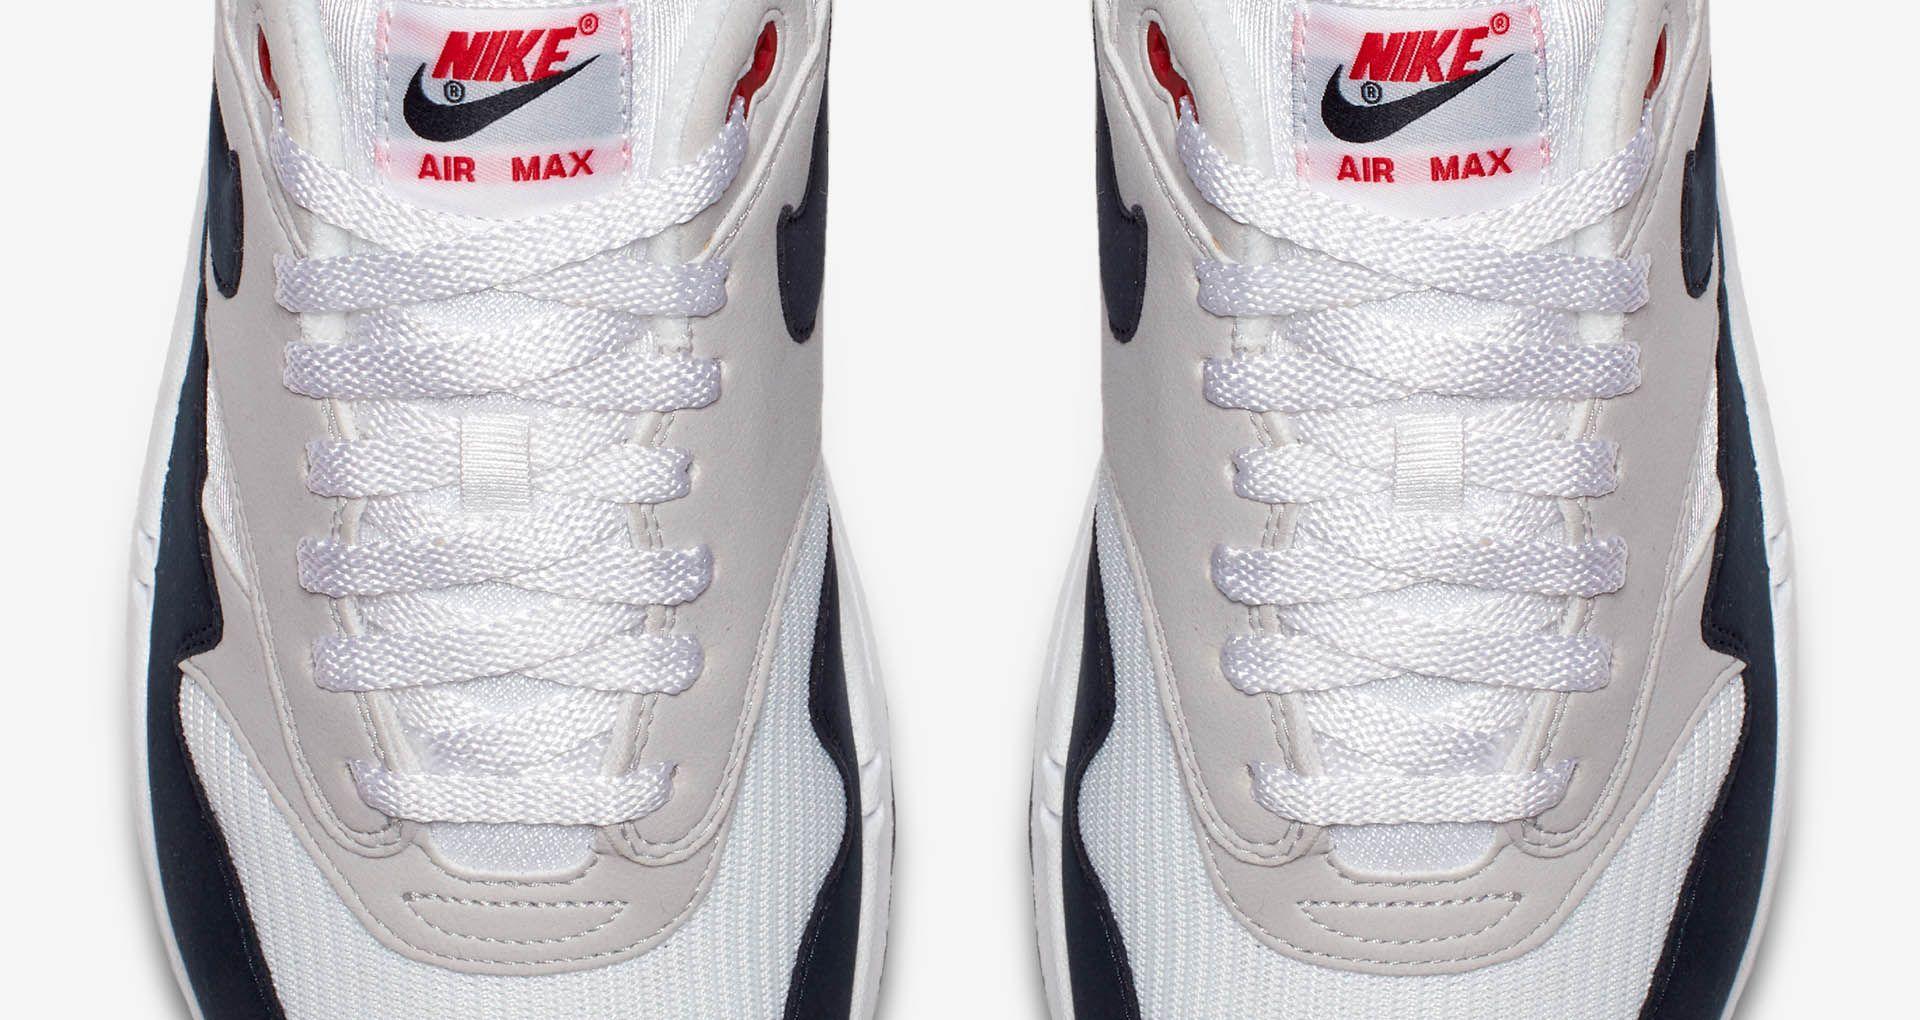 Nike Air Max 1 Anniversary 'White & Dark Obsidian' Release